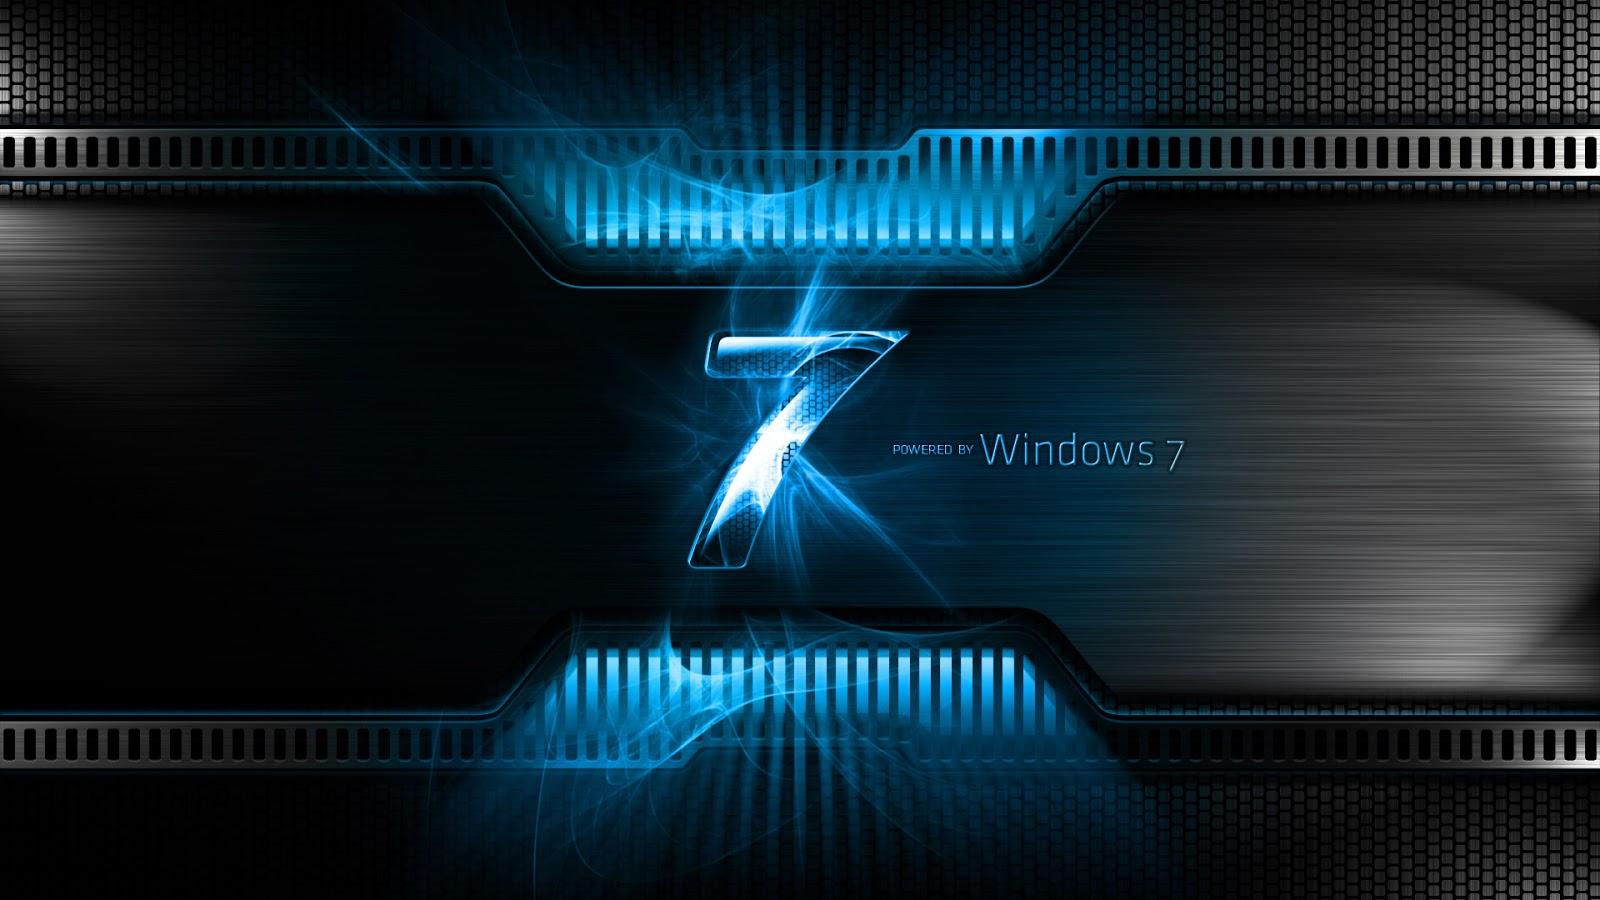 Windows 7 Ultimate 32 Bit Activator Free Download 3